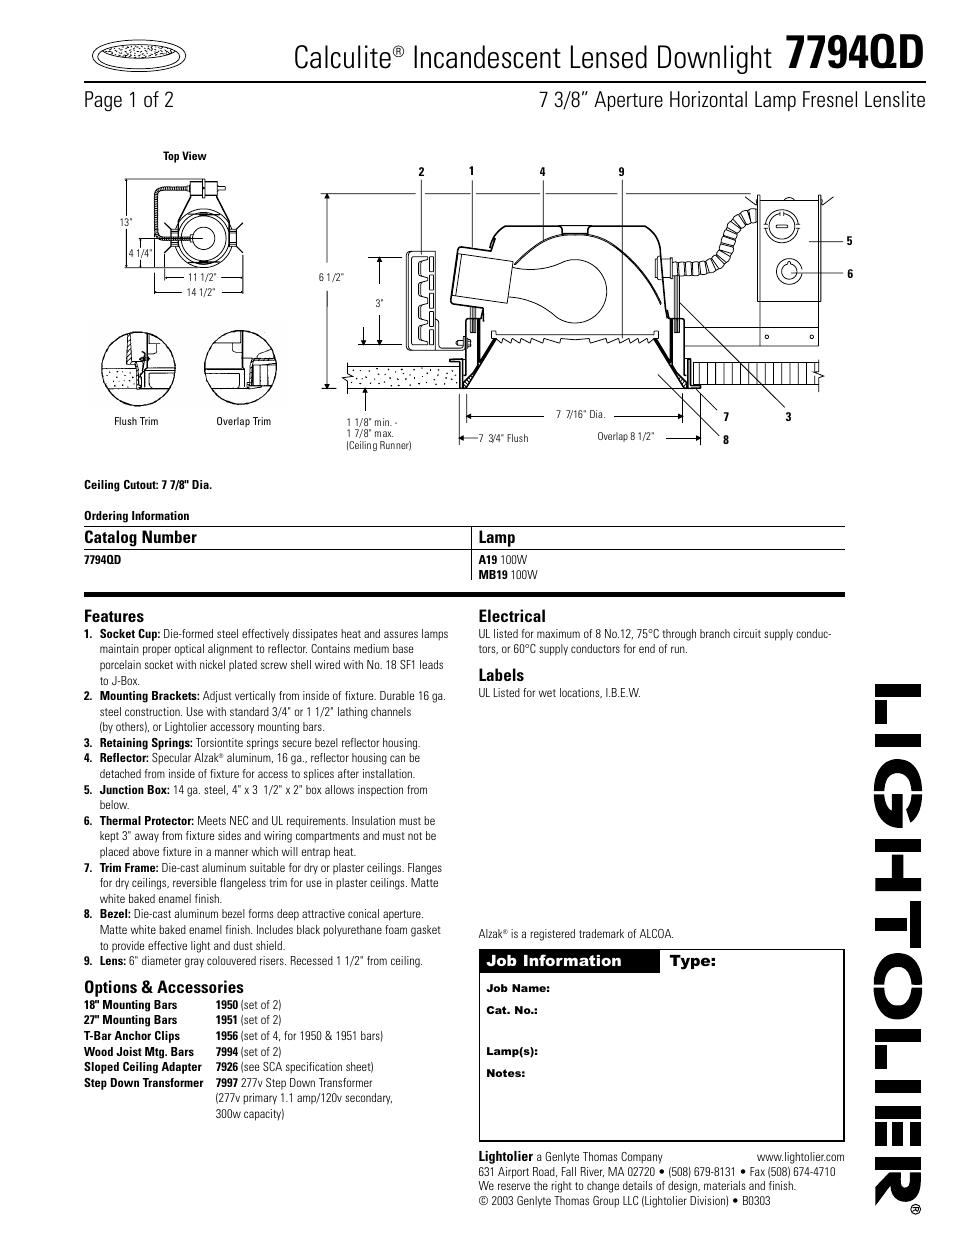 lightolier wiring diagram wiring diagram schematics • lightolier wiring diagram wiring diagram home rh 4 6 2 medi med ruhr de basic electrical